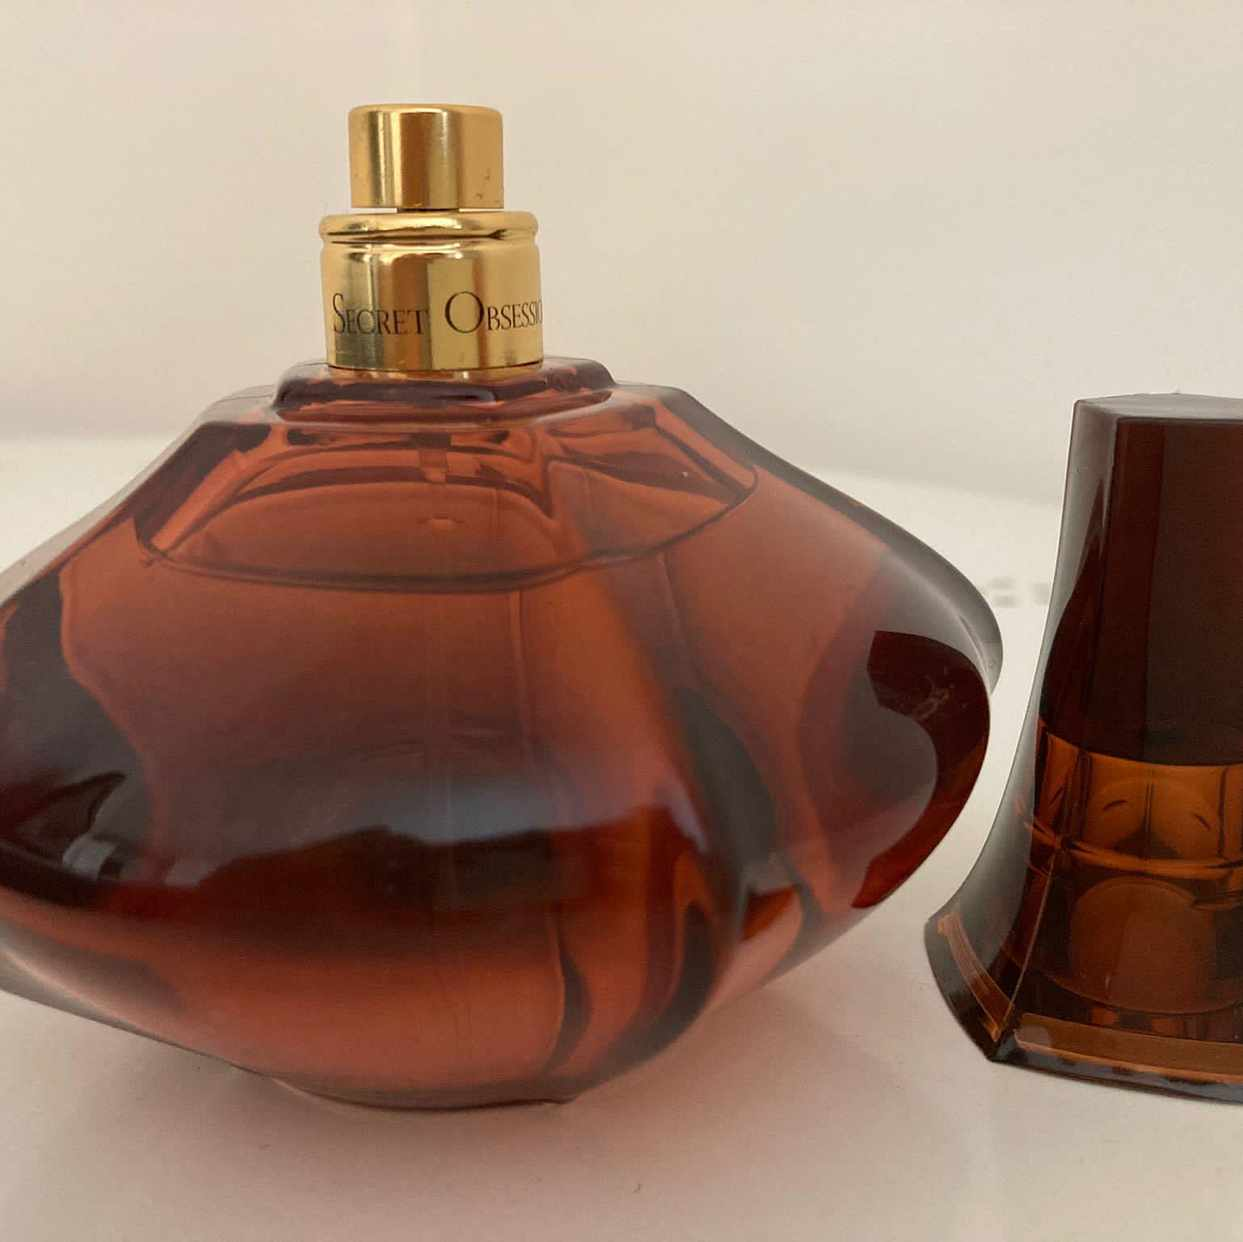 image of Perfume - Hägersten